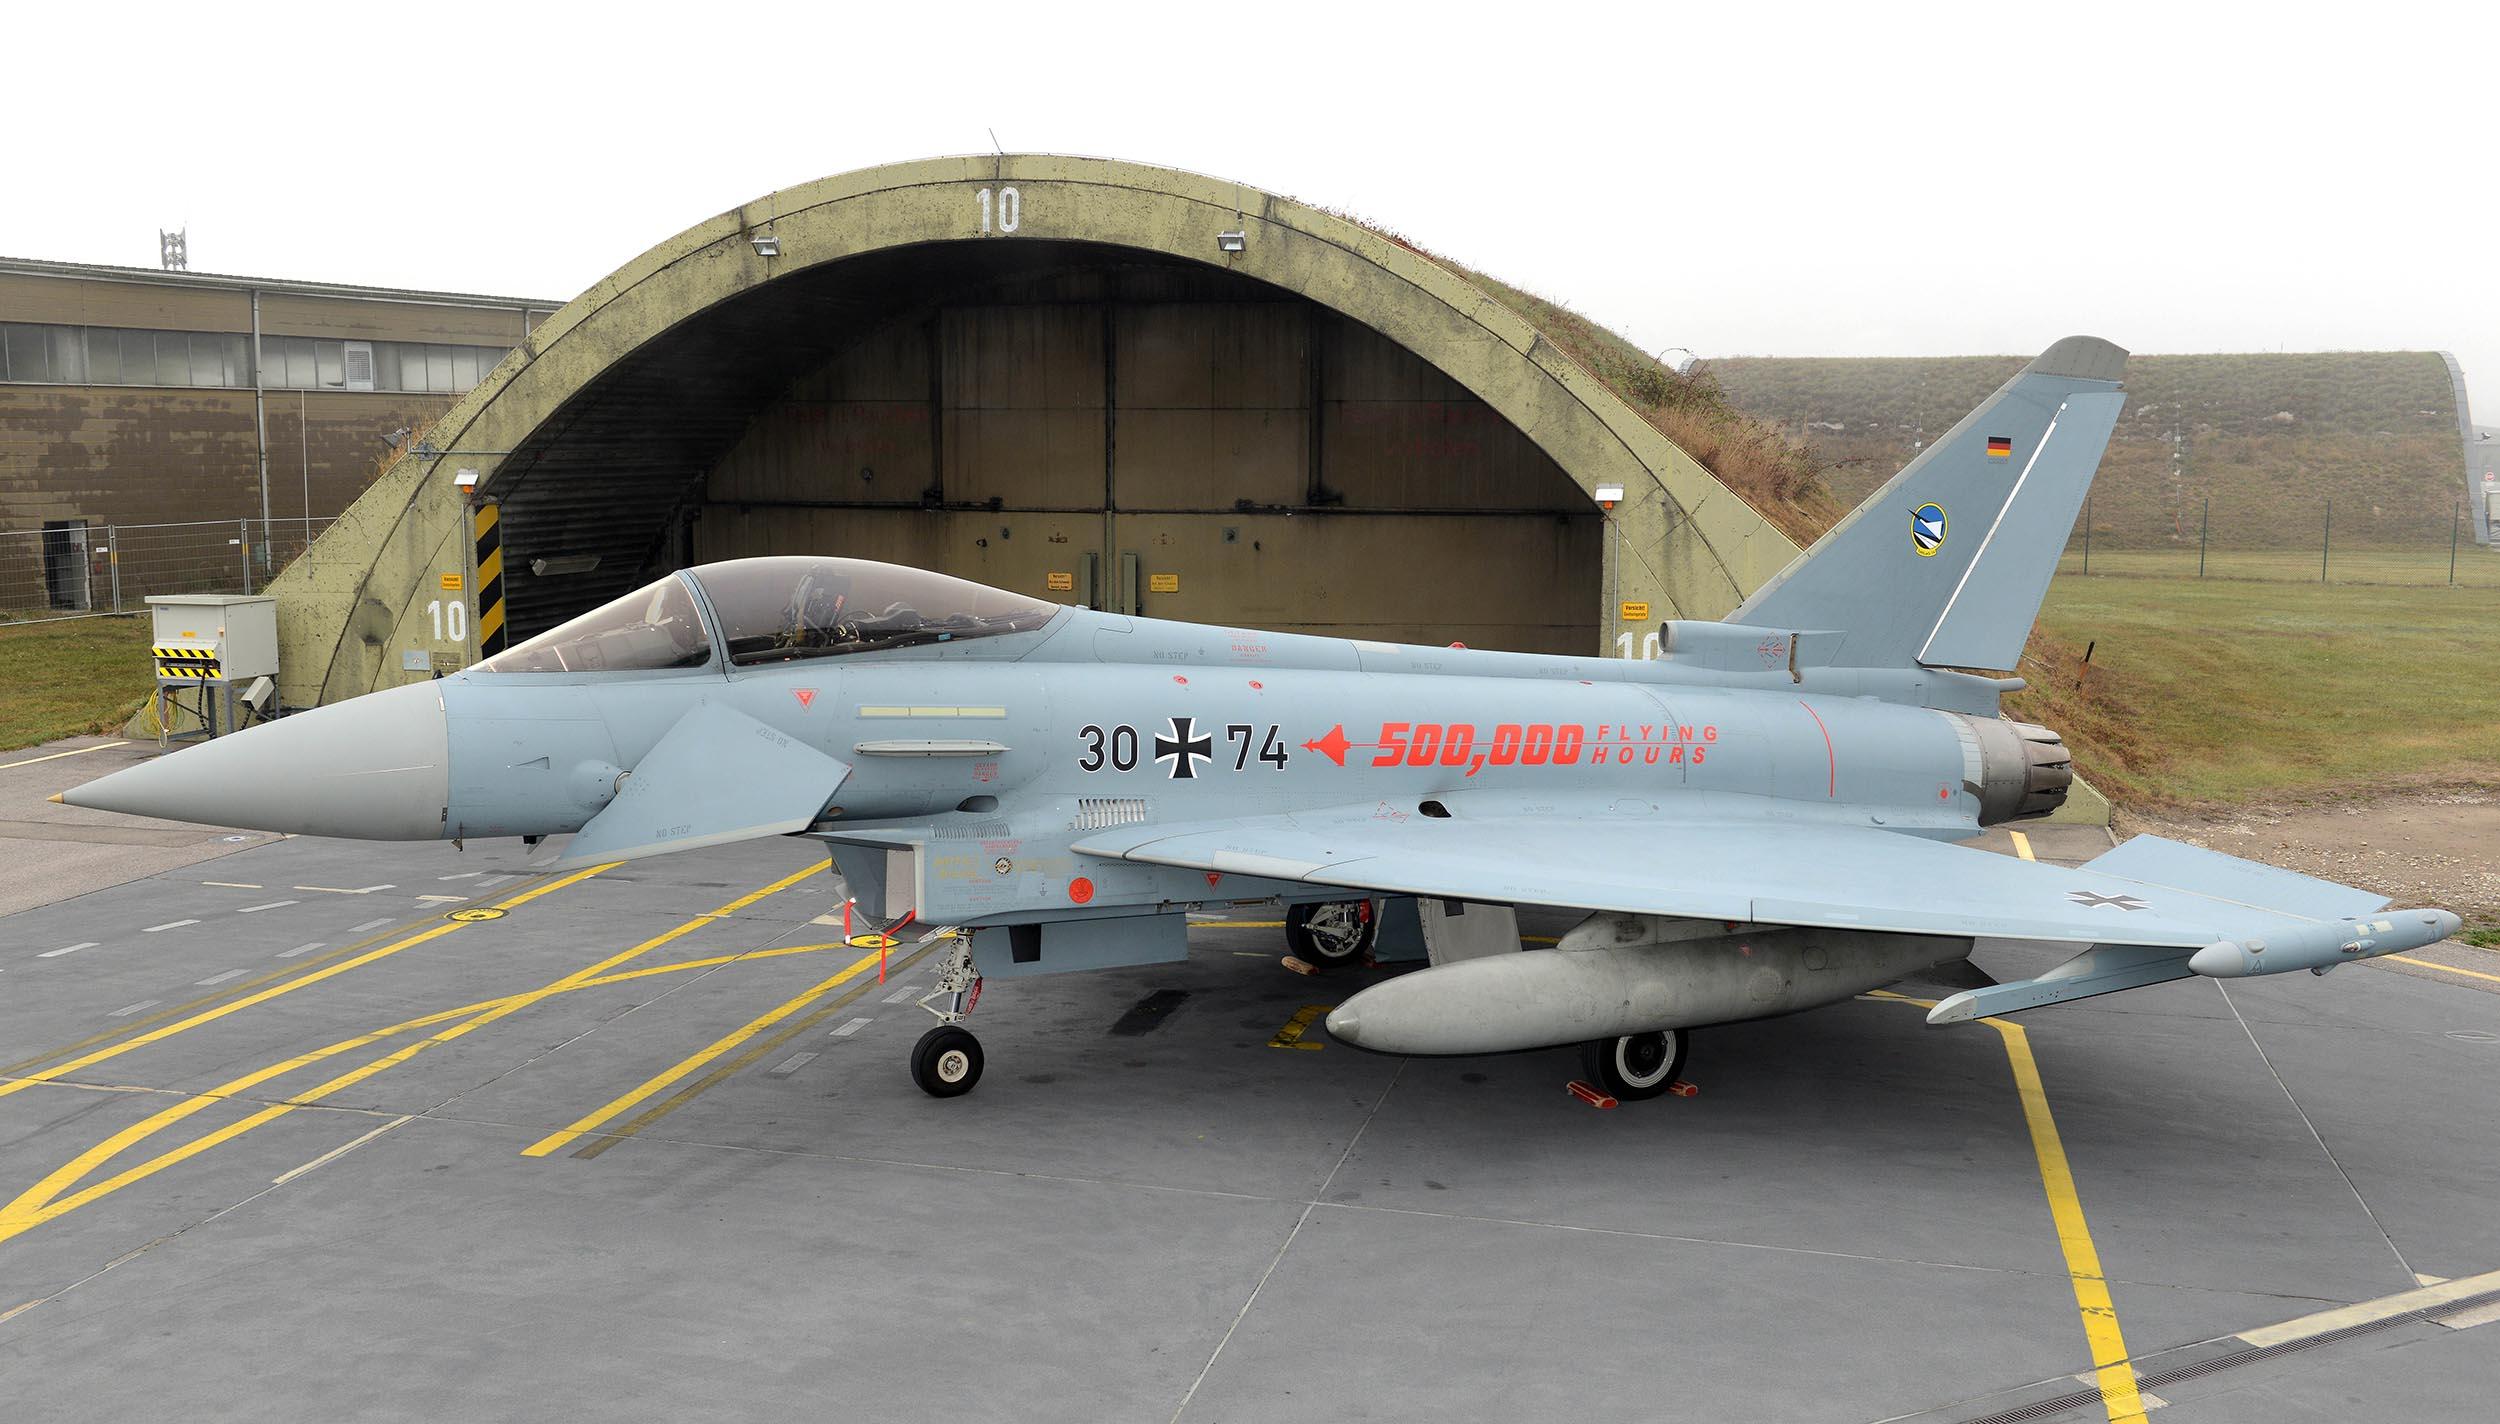 eurofighter-500_000-gesamtflugstunde-1-low.jpg